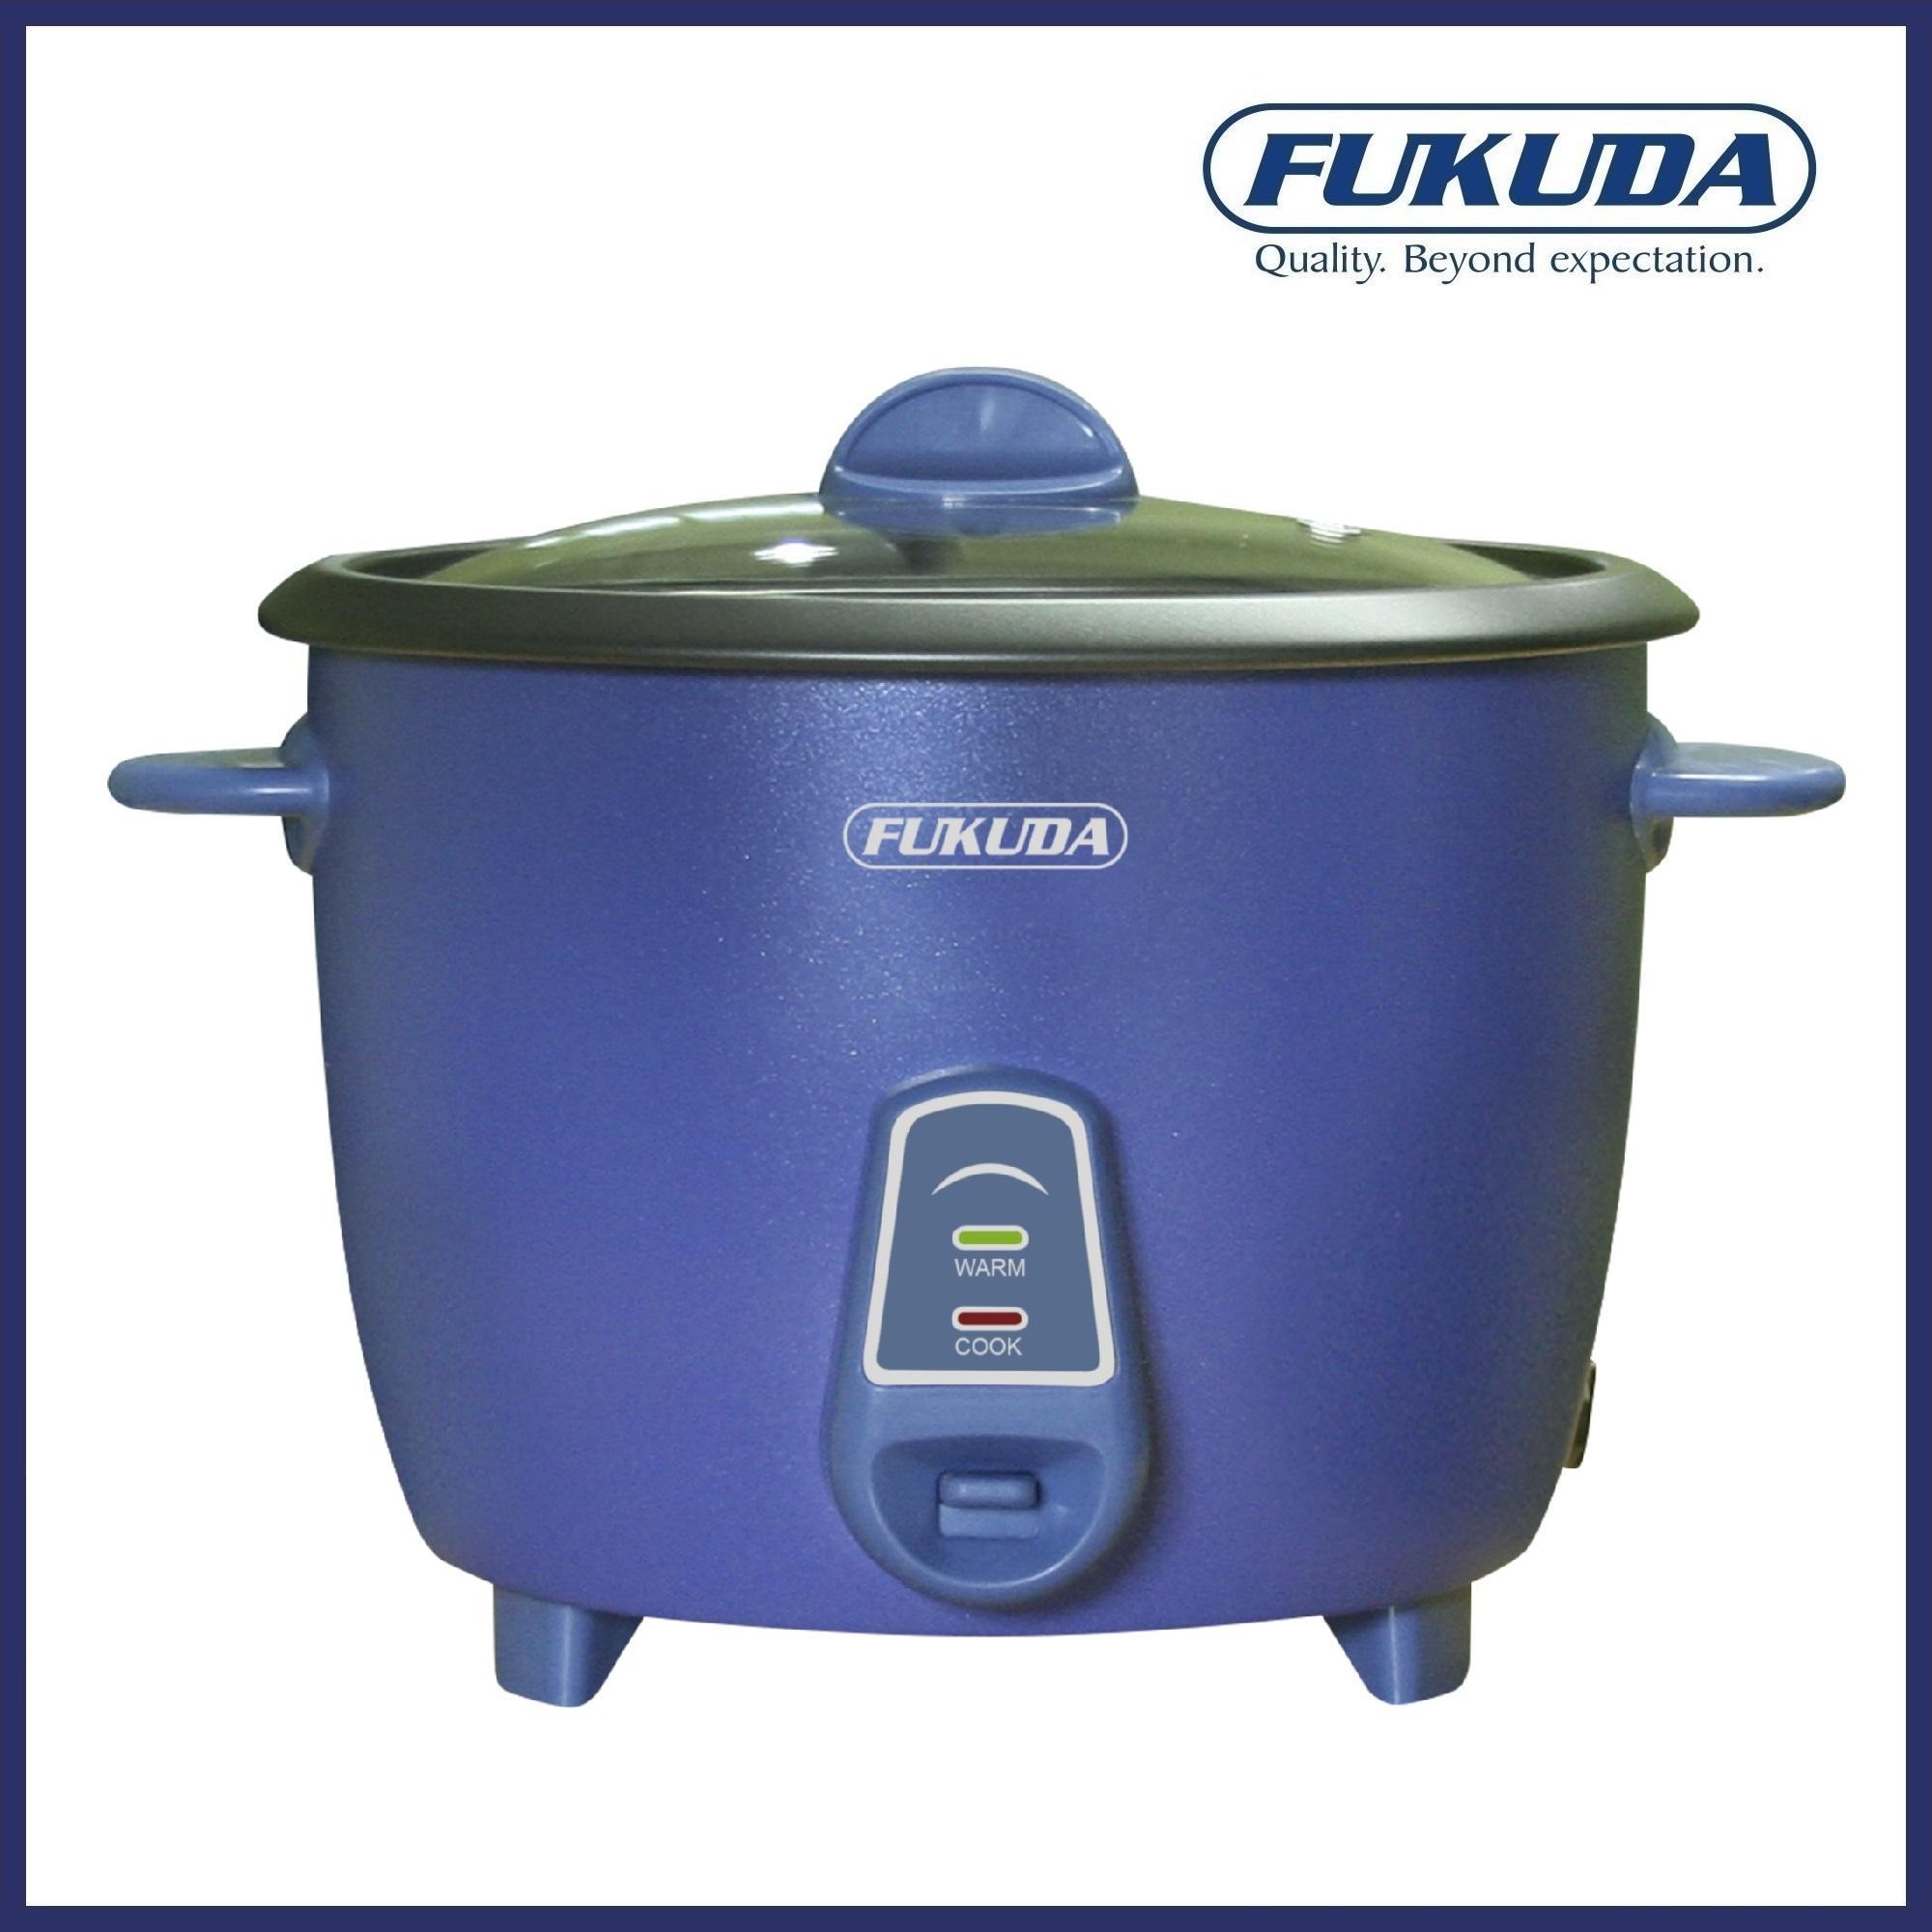 Fukuda FRC818M 10 Cup Matte Finish Drum Type Rice Cooker 1.8L (Violet)